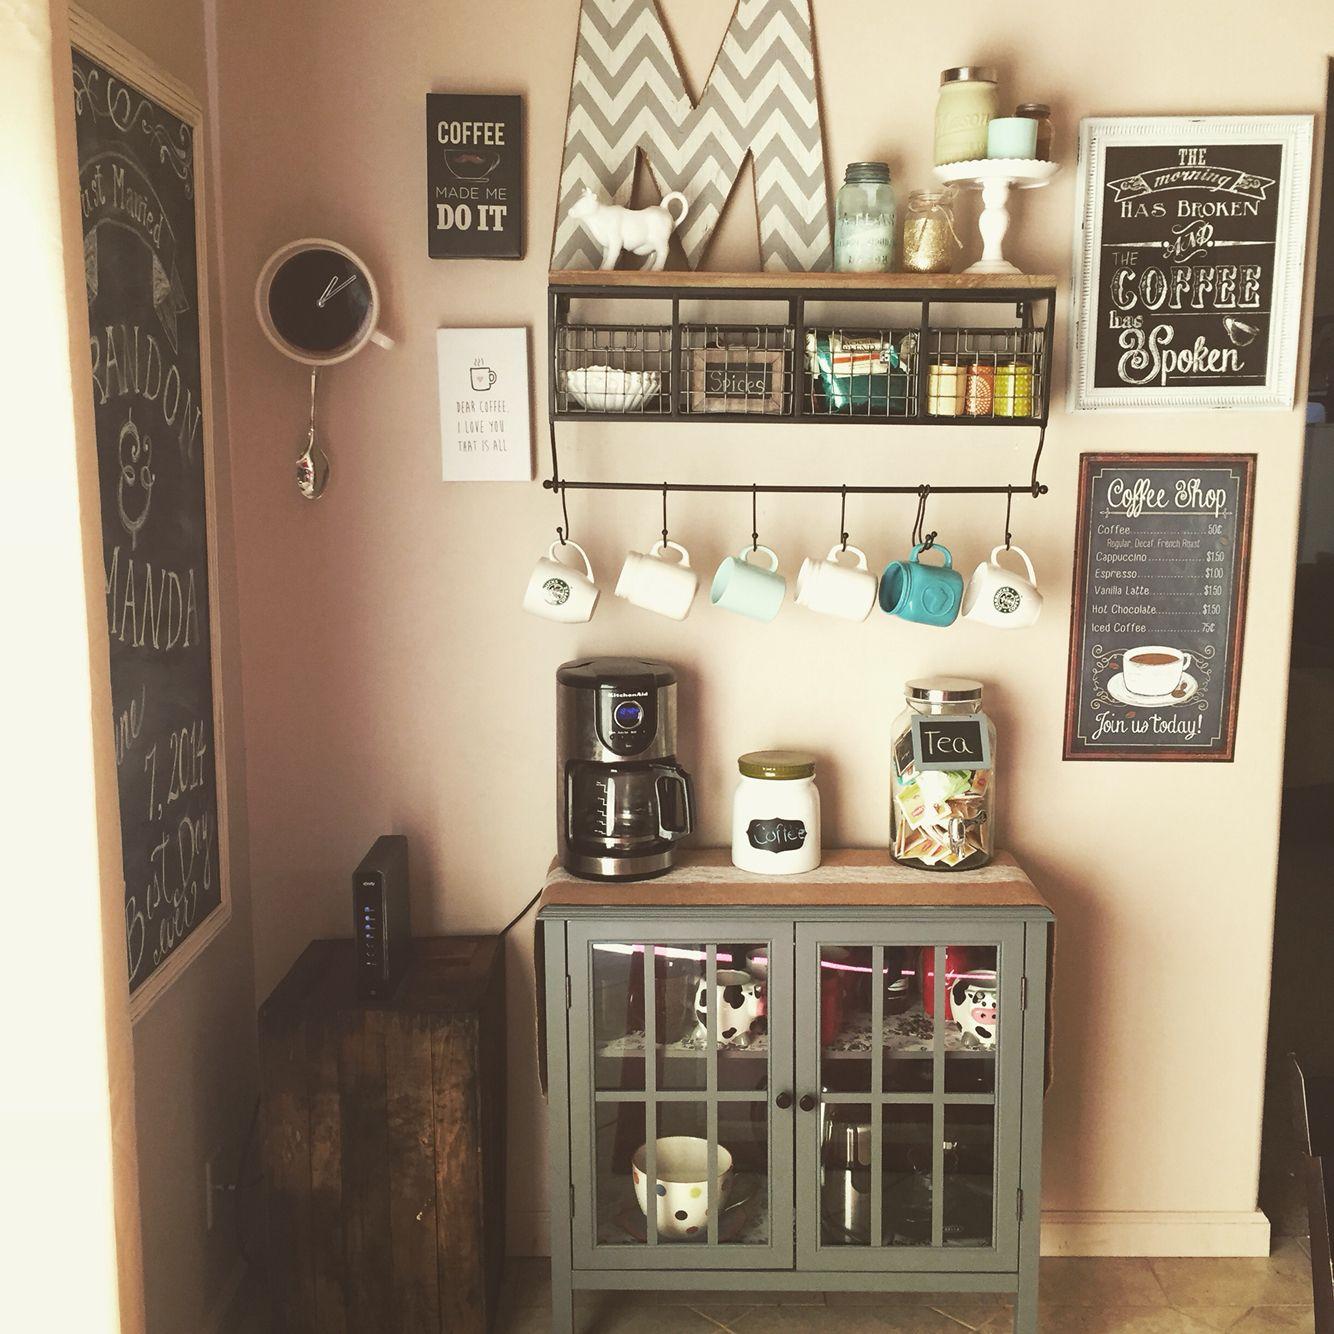 Coffee Bar Mug Shelf Holder From Hobby Lobby 120 Buy On